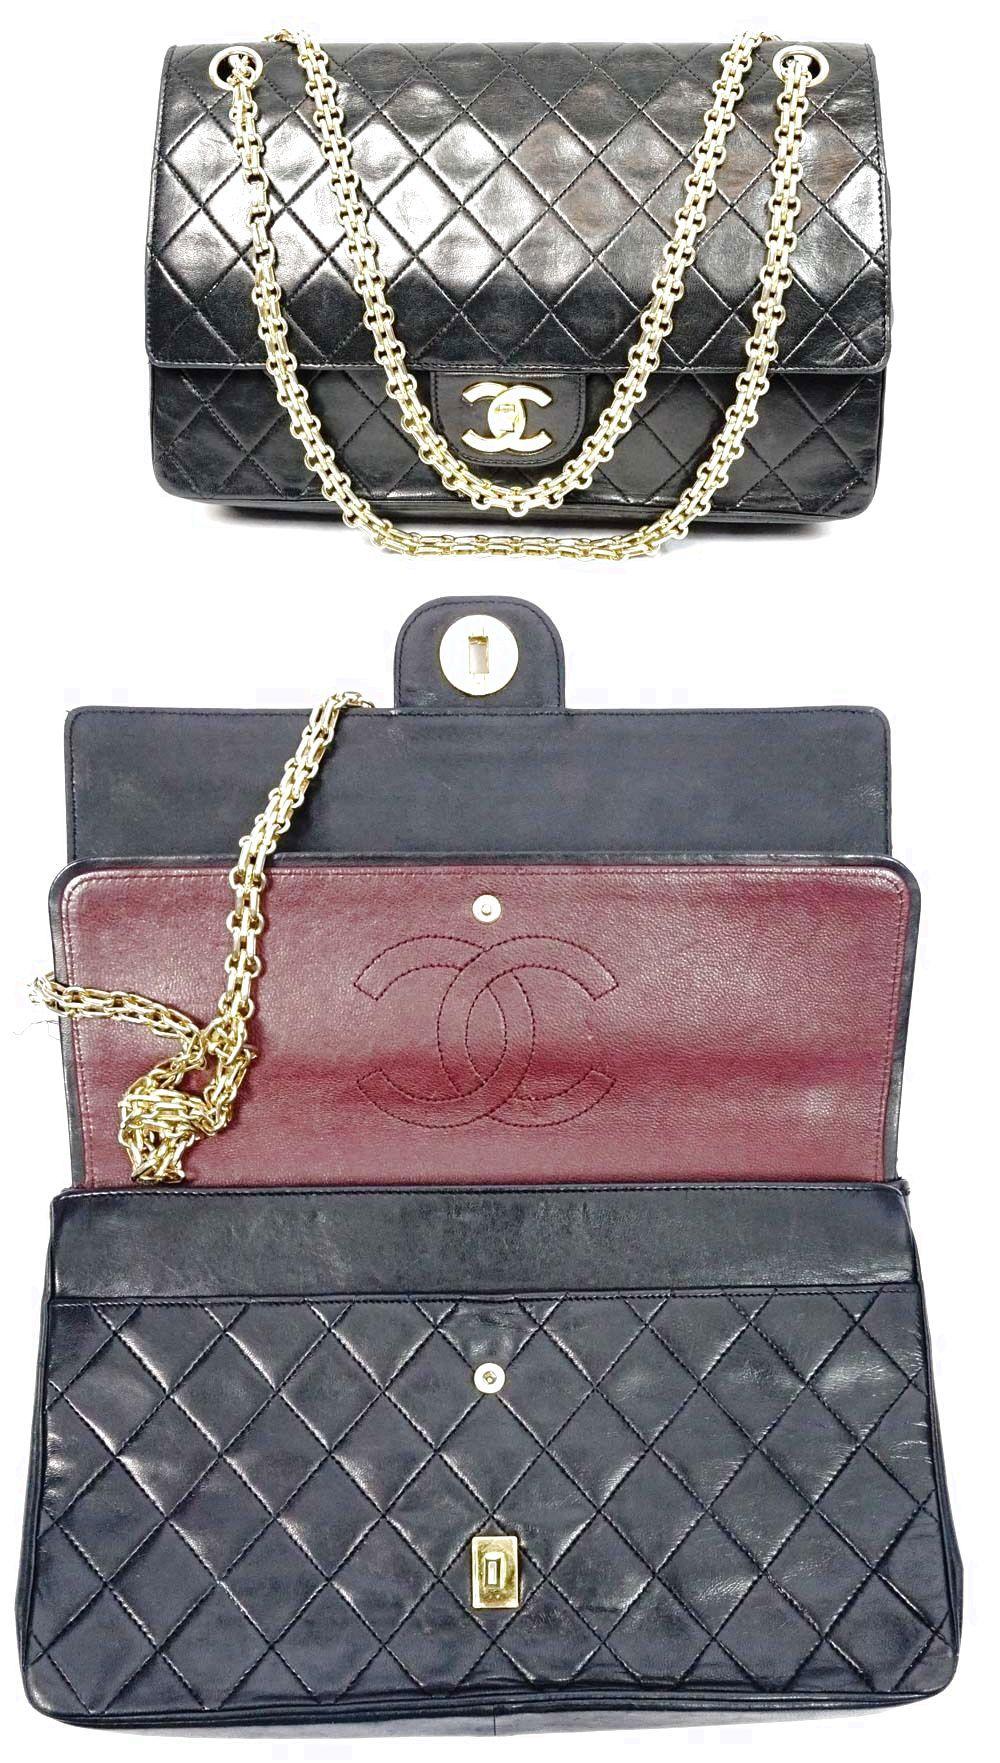 chanel lamb skin leather cc logo black chain tote purse handbag shoulder bag 89999 chanel handbags pinterest tote purse logos and lamb